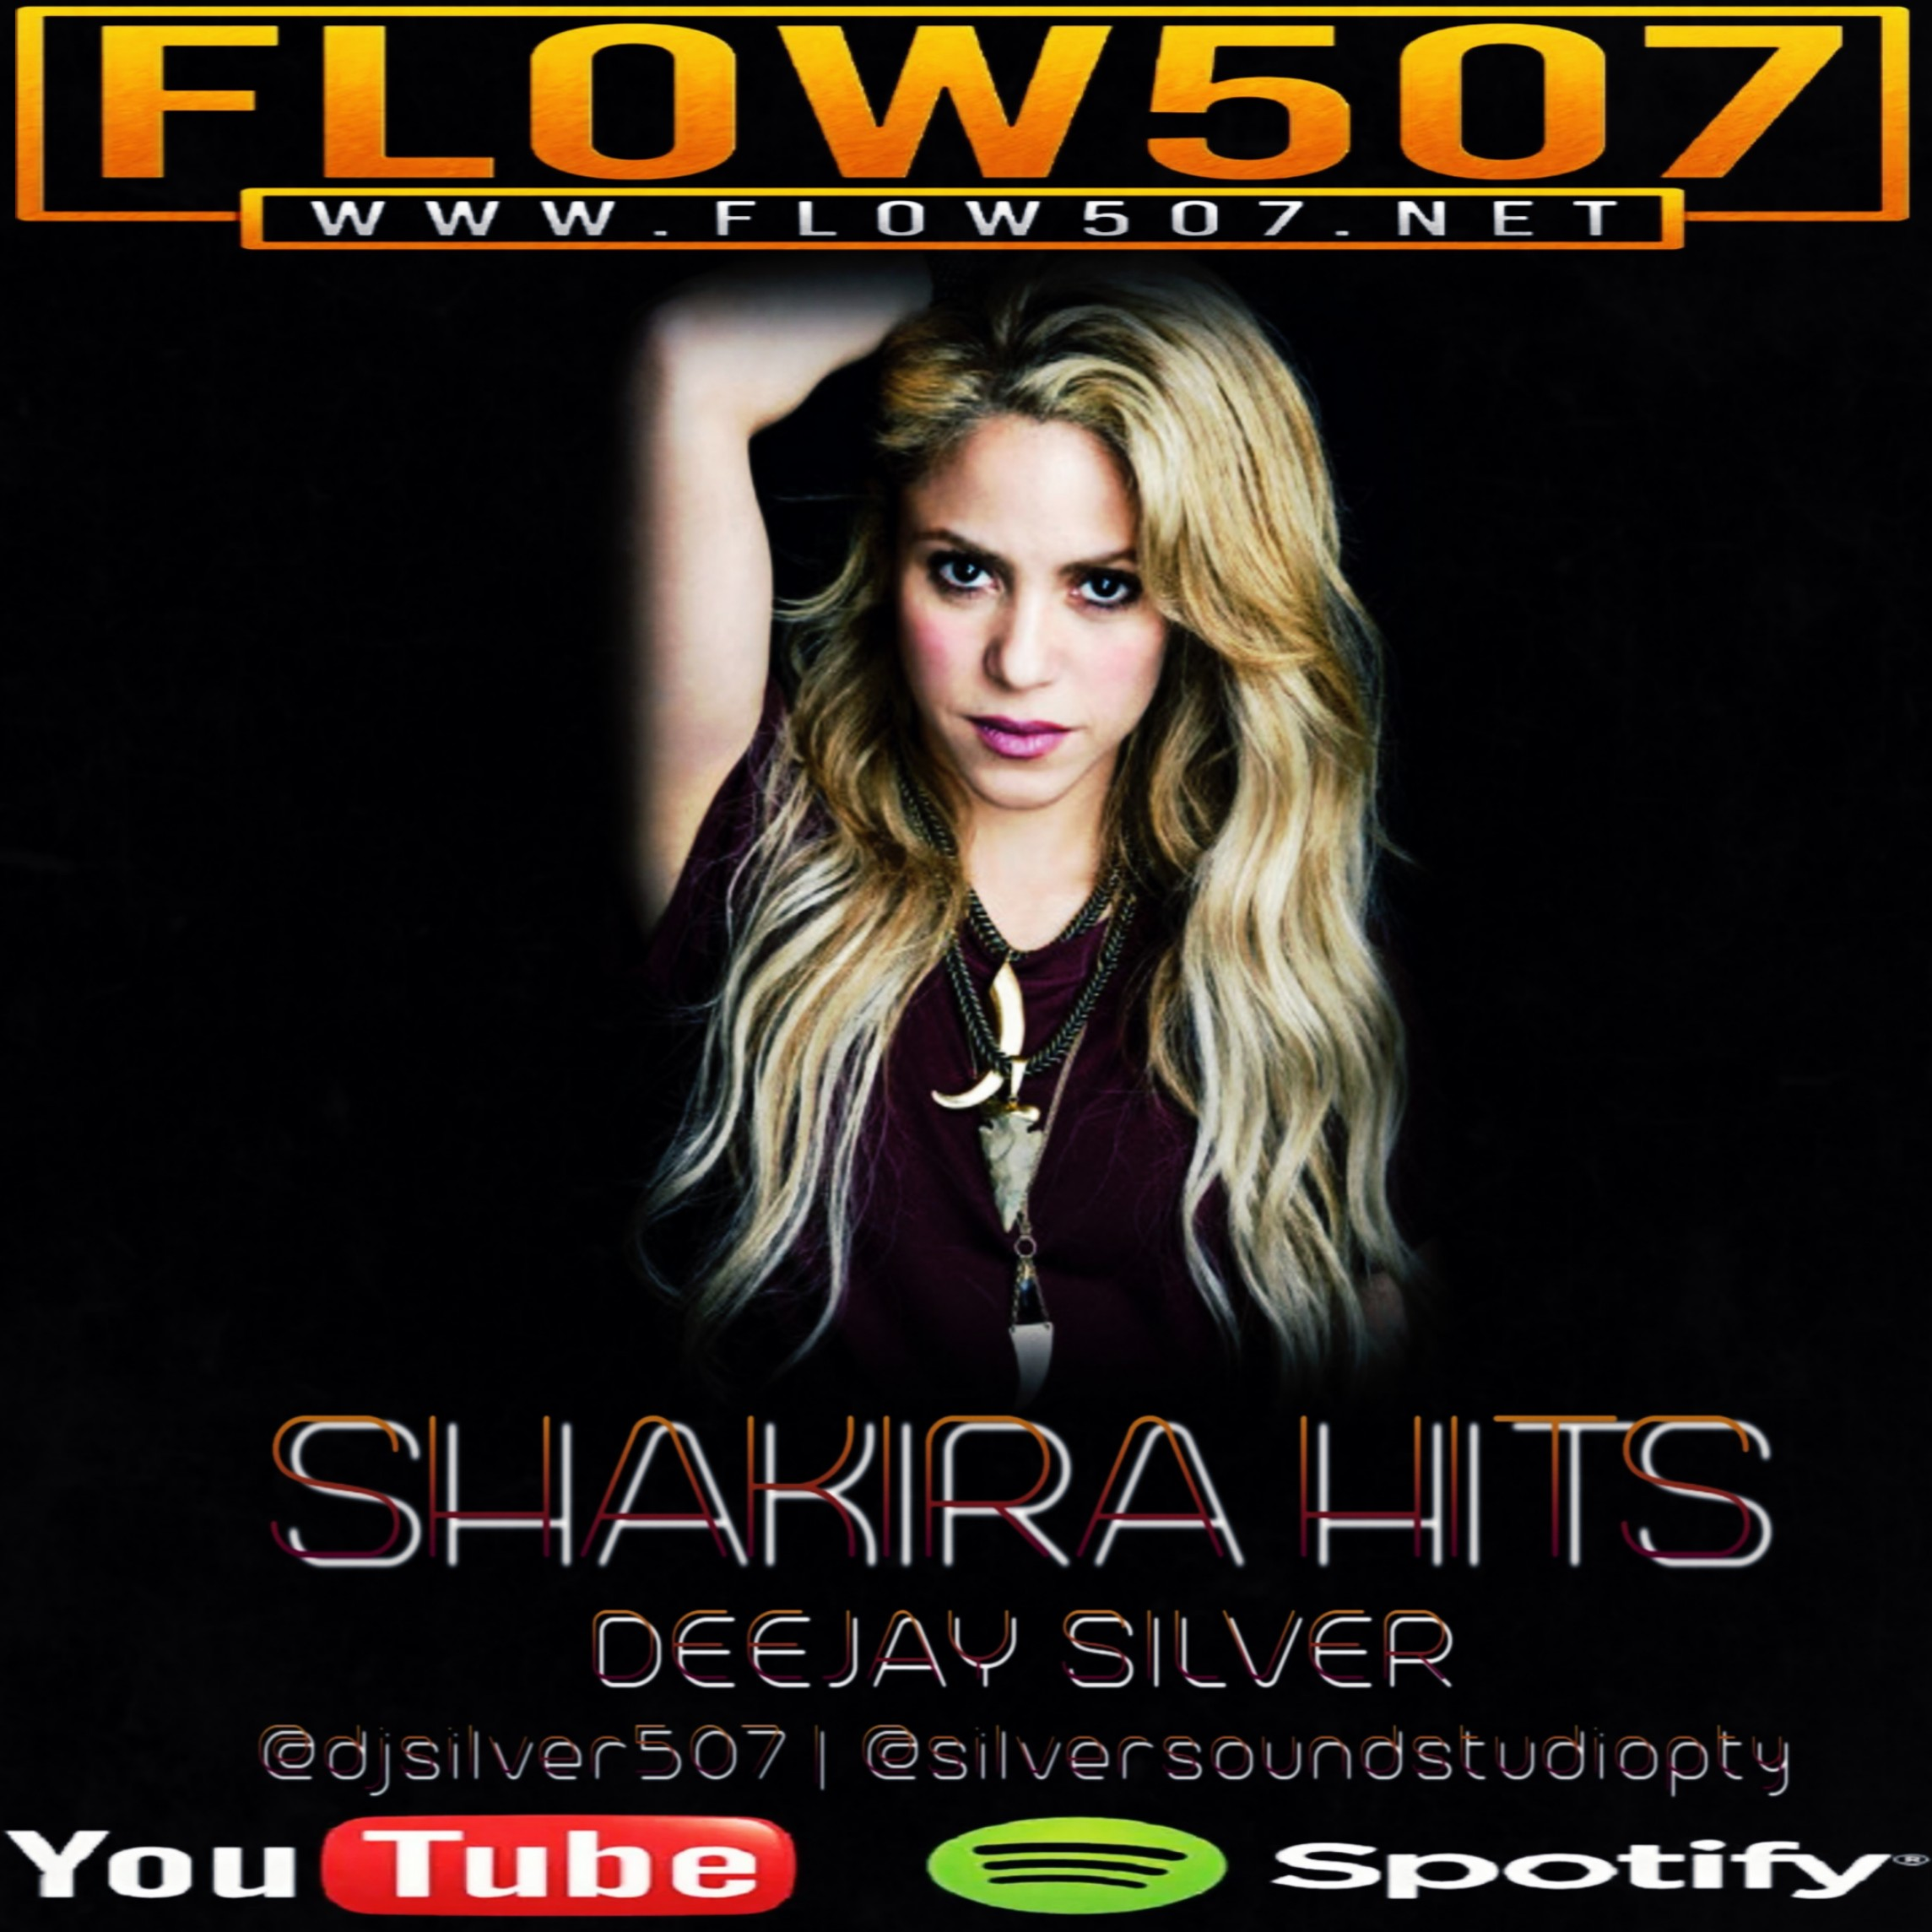 FLOW507.NET - SHAKIRA HITS MIX - DEEJAY SILVER